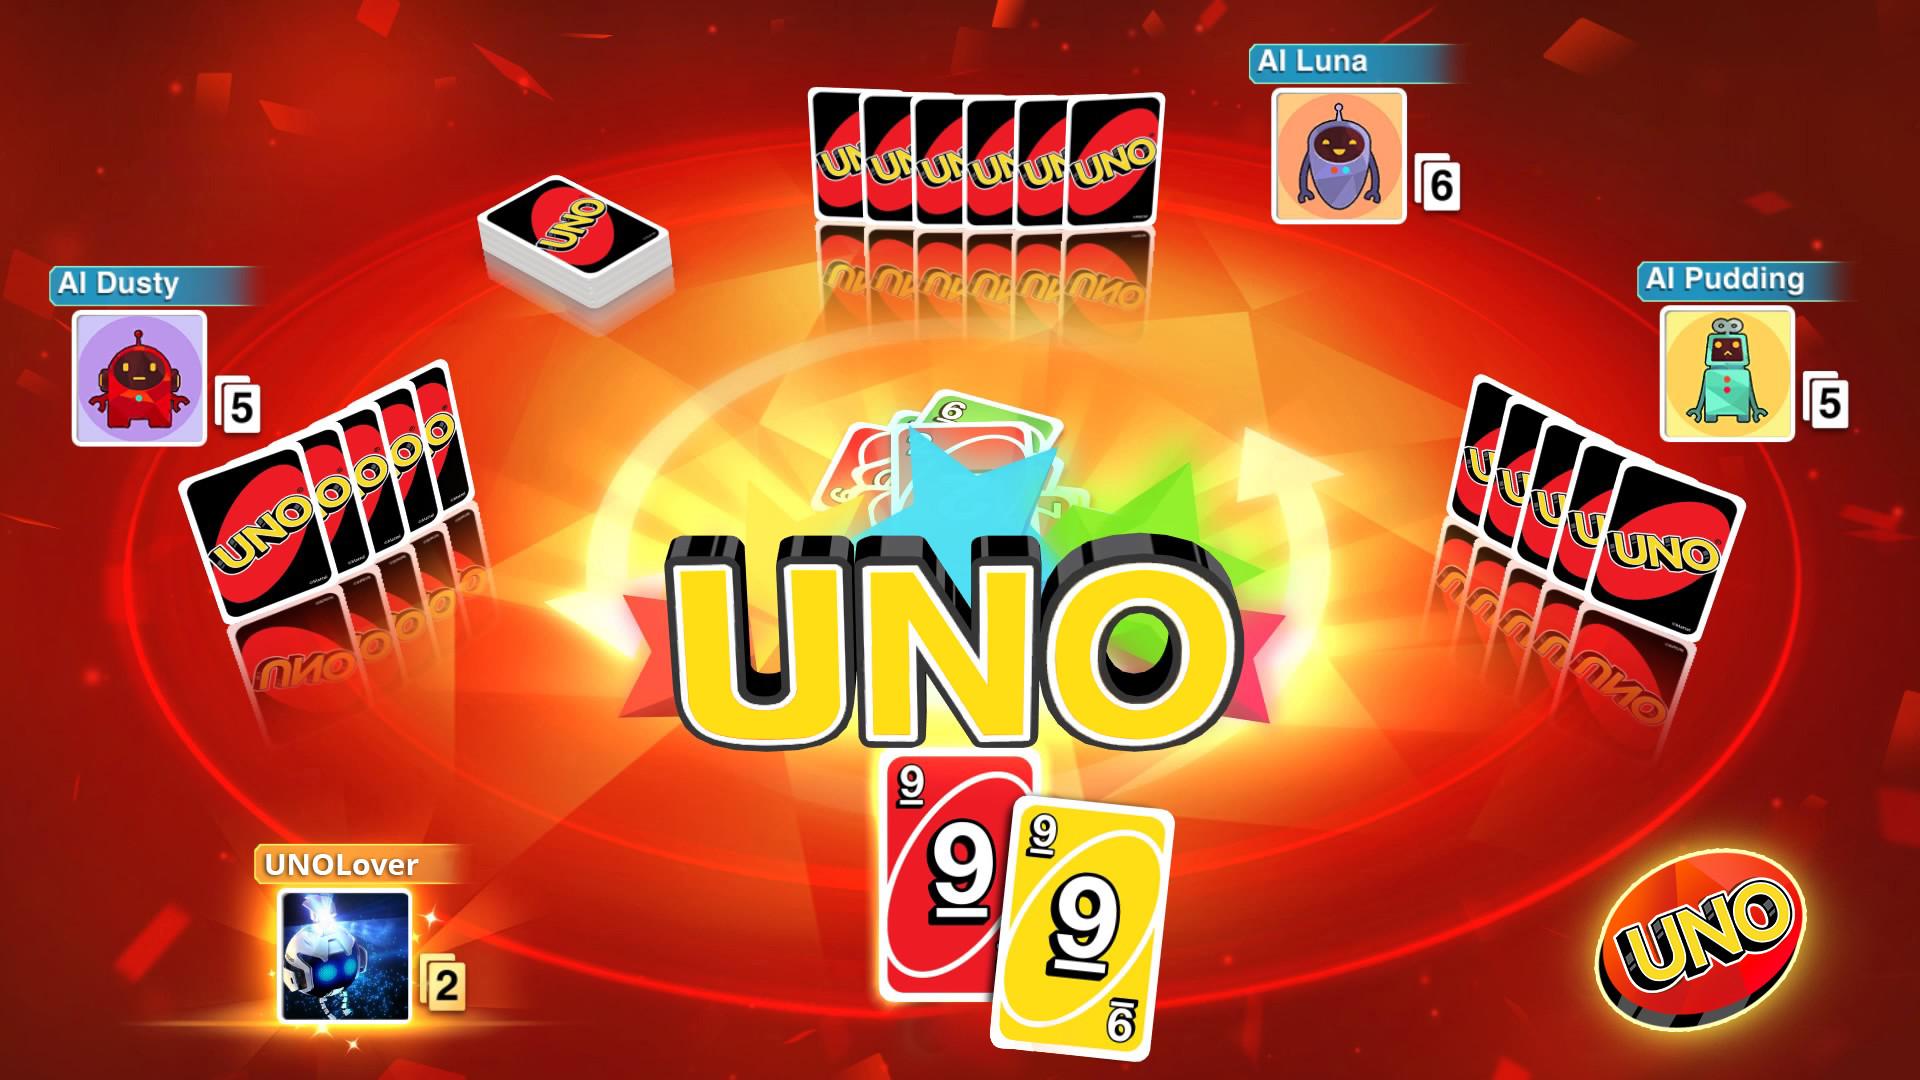 videojuego UNO